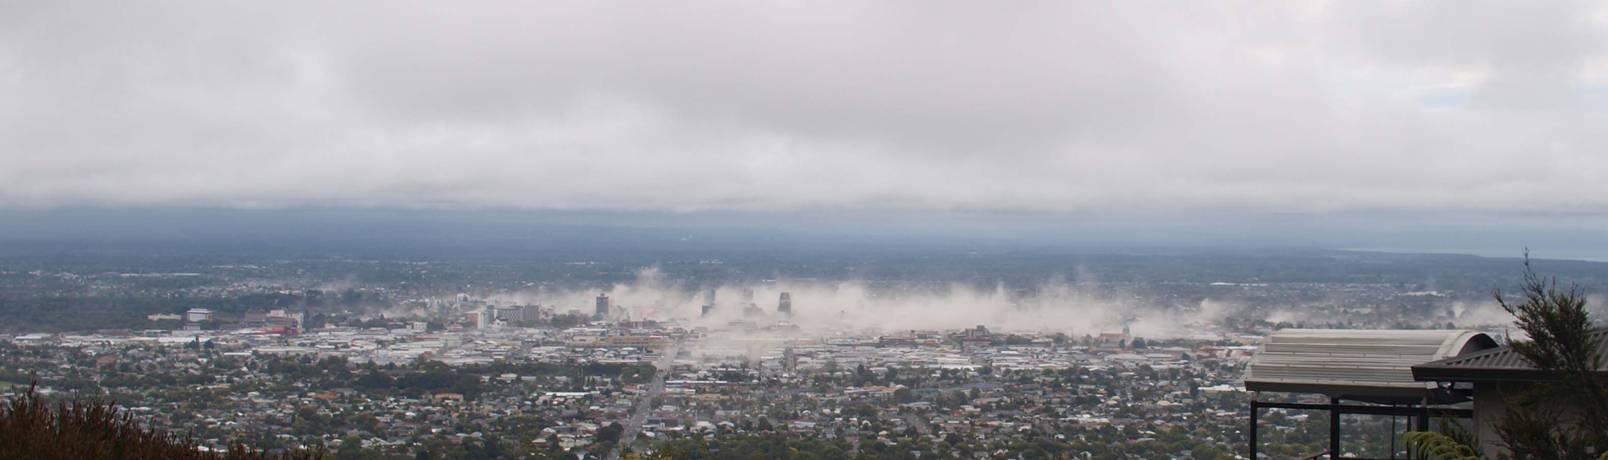 earthquake-dust.jpg